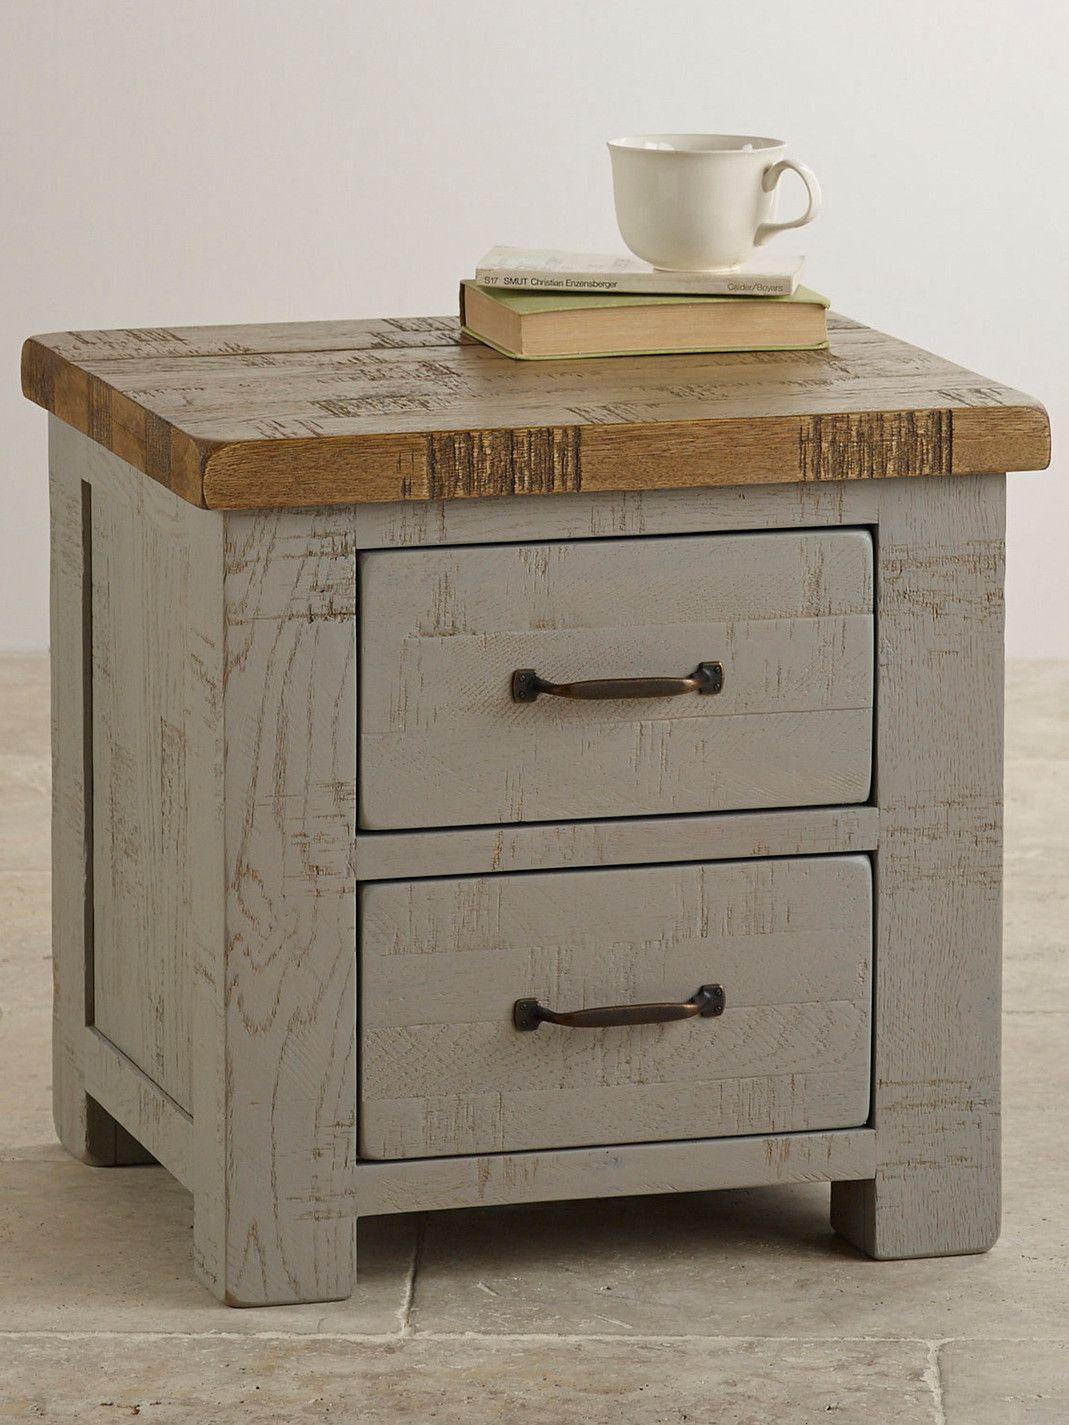 Clermont Painted Rough Sawn Solid Oak 2 Drawer Bedside Cabinet Oak Furniture Land Solid Wood Furniture Bedside Cabinet